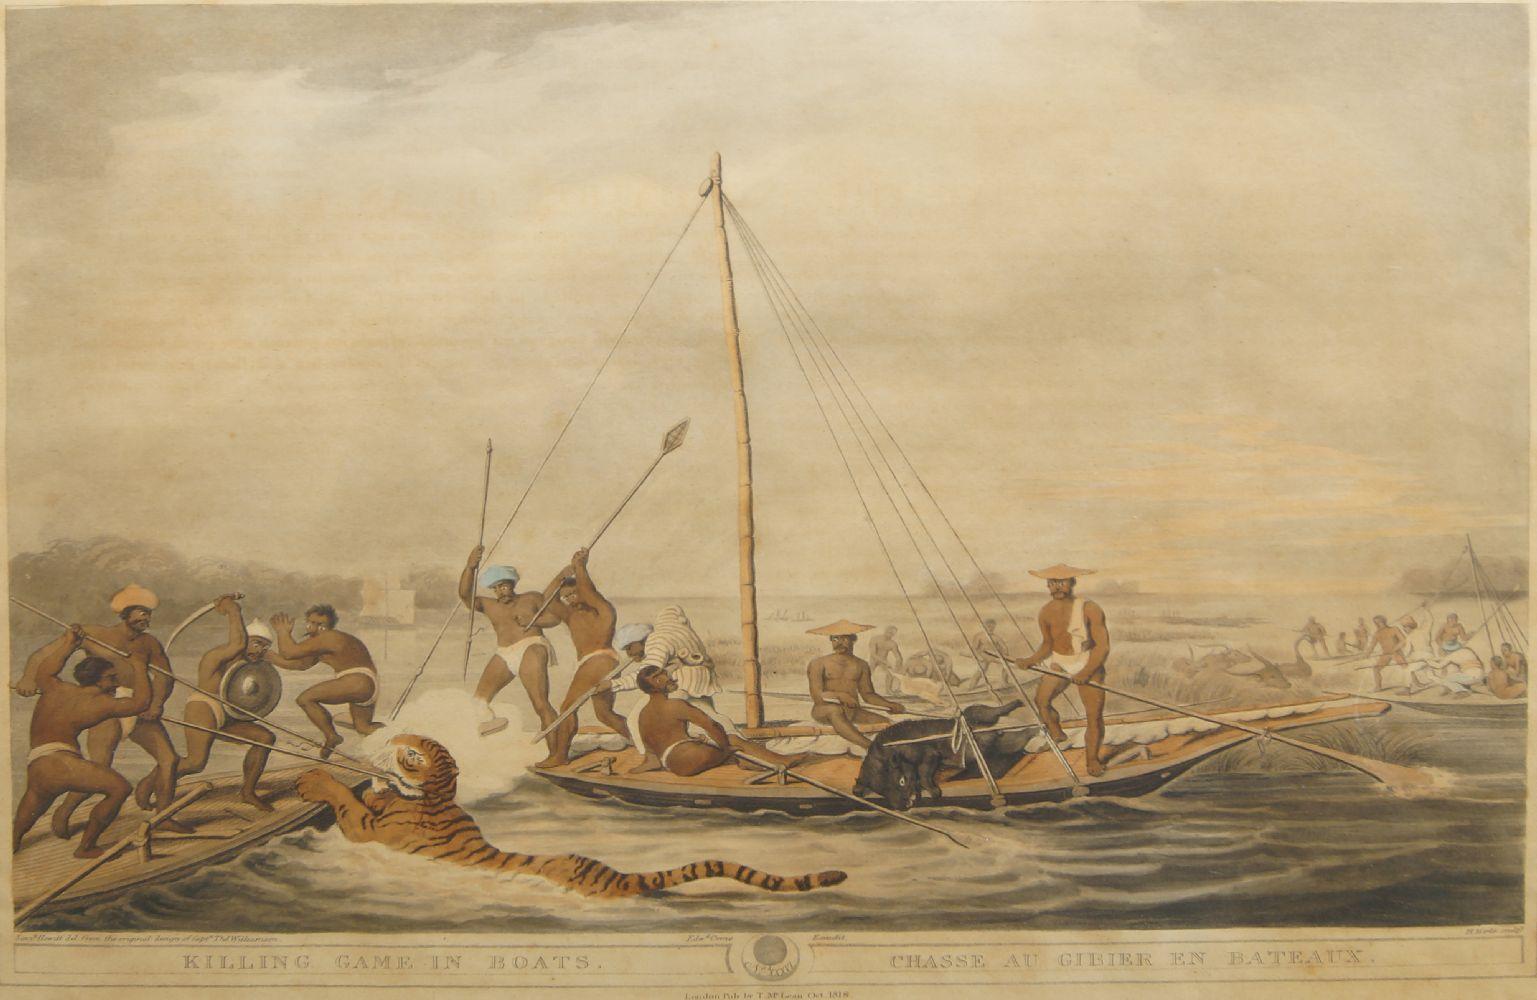 Henri Merke, British/Swiss fl. 1799-1820- Killing Game in Boats/Chasse au Gibier en Bateaux, after